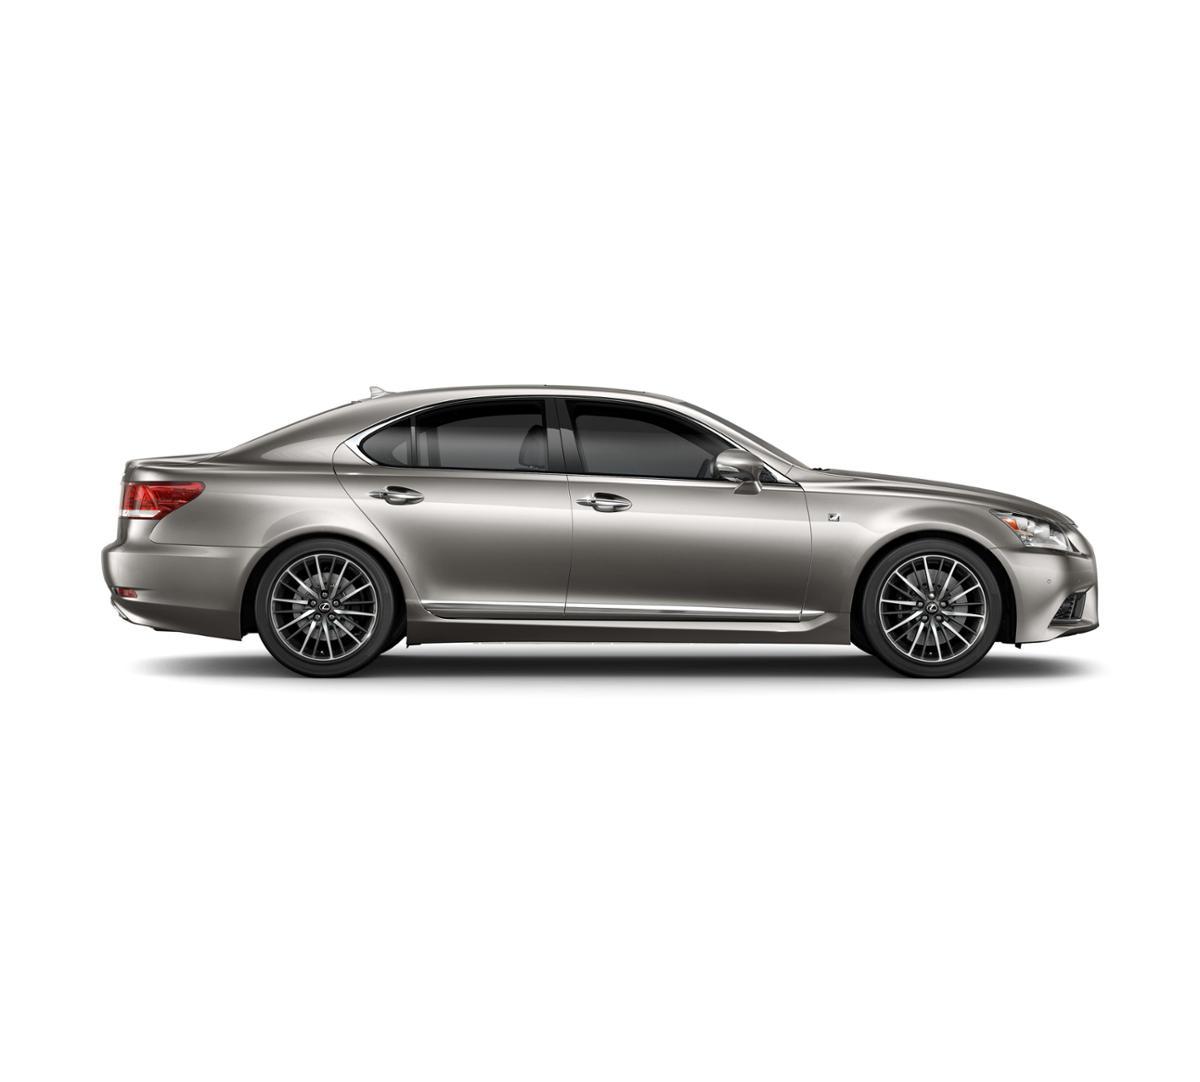 Escondido Atomic Silver 2017 Lexus LS 460: New Car For